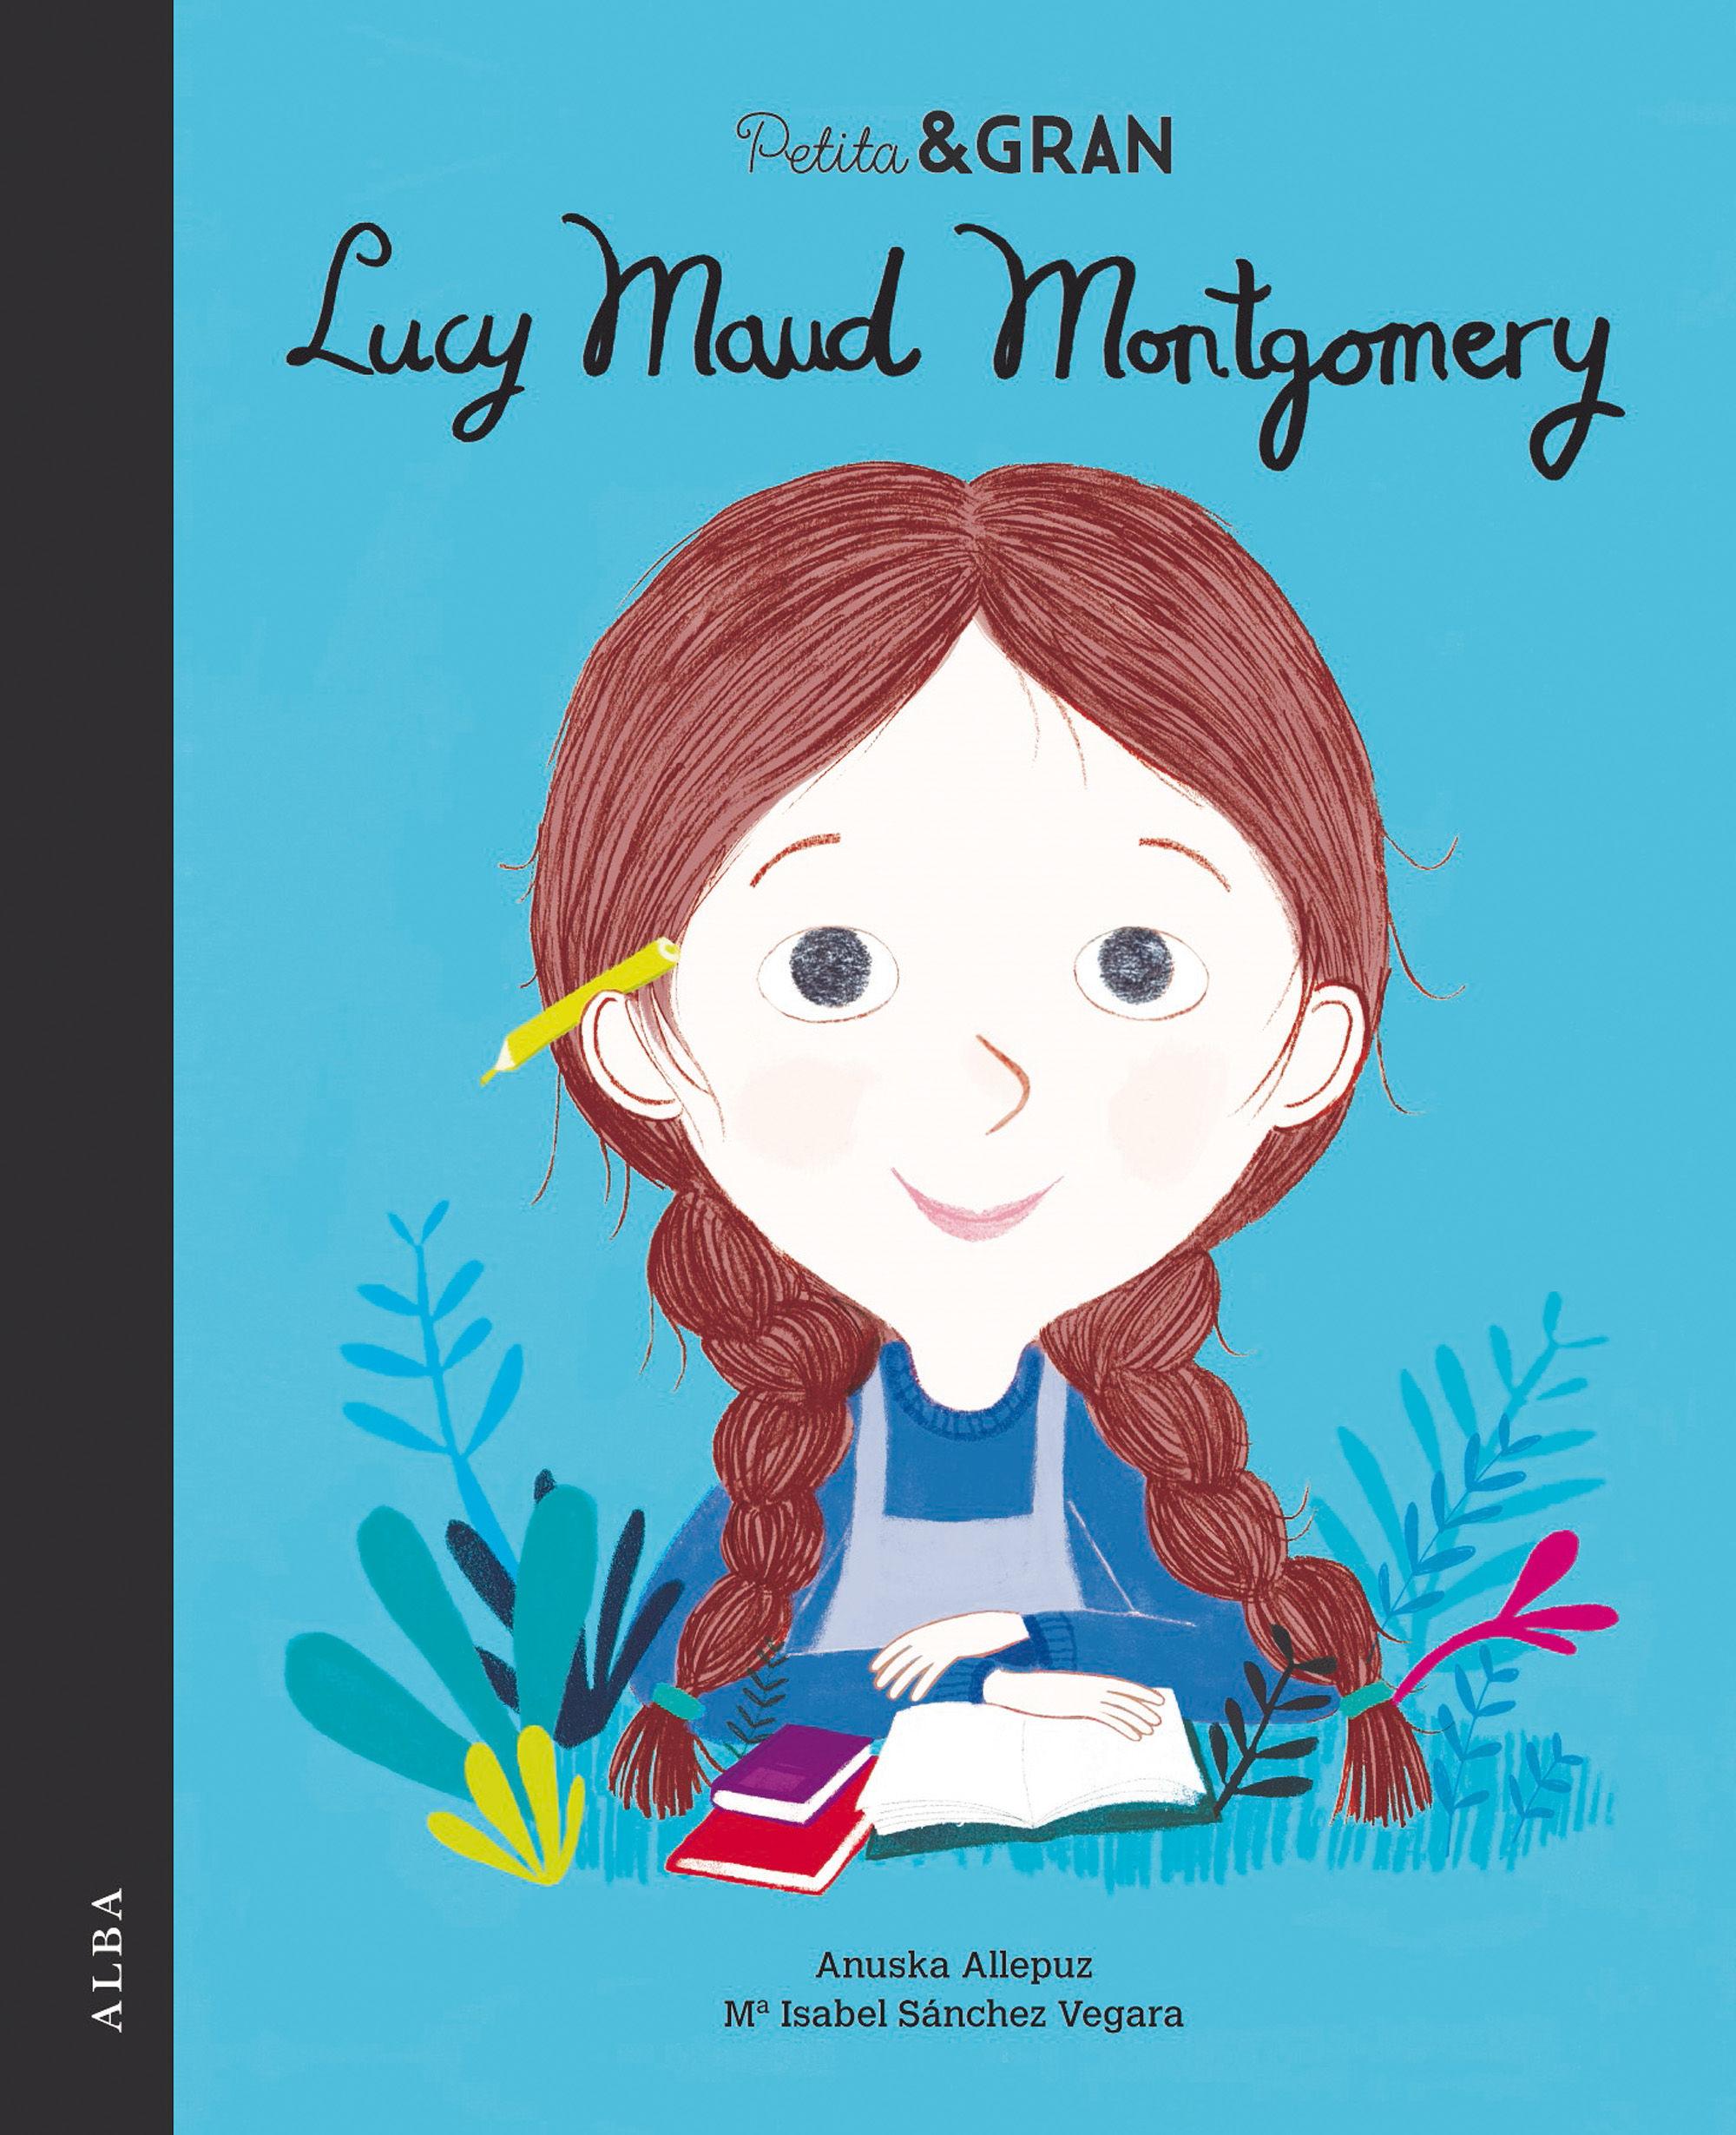 PETITA & GRAN LUCY MAUD MONTGOMERY